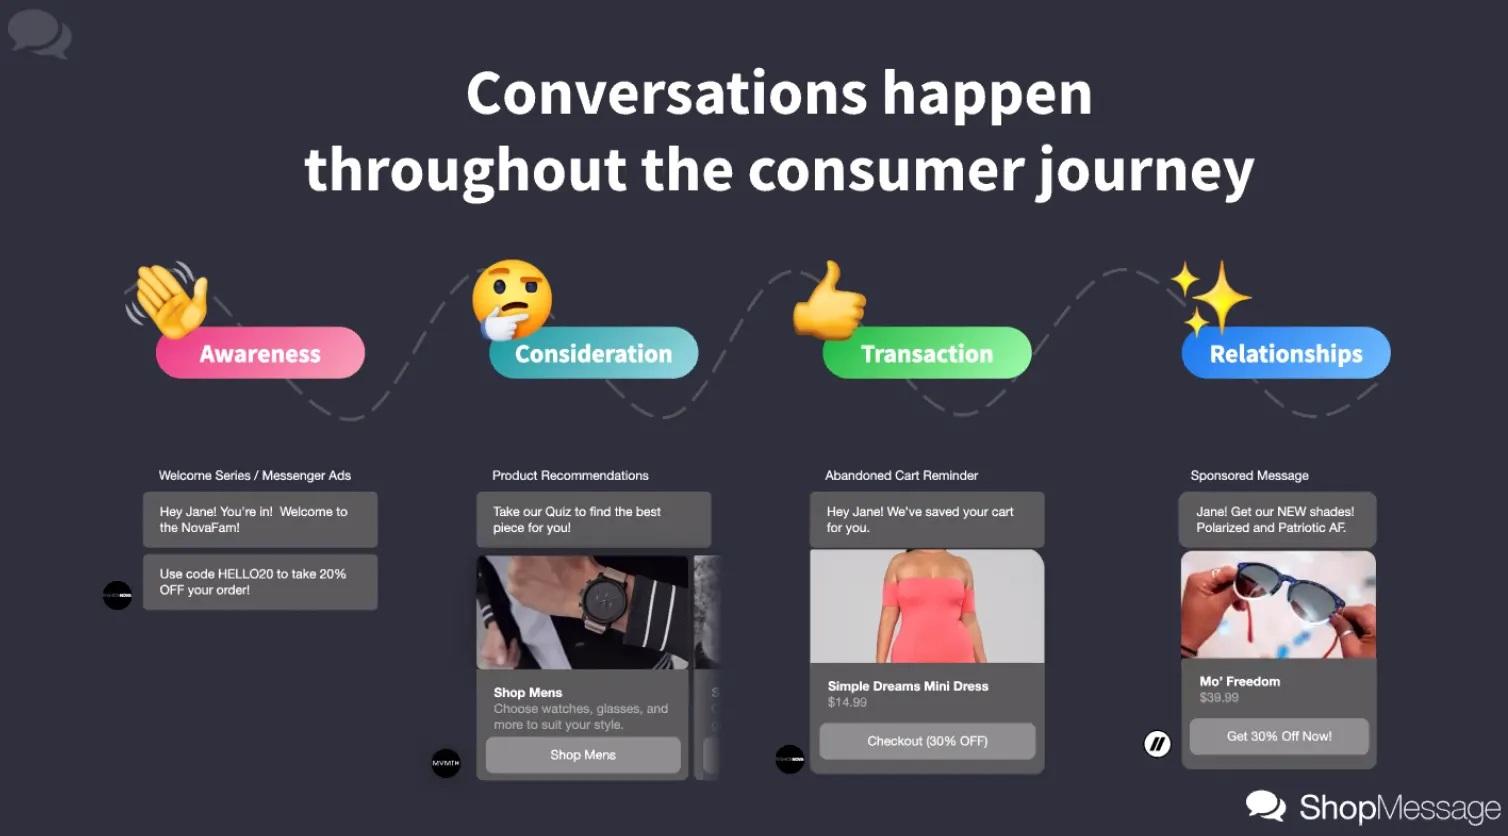 Shopmessage conversations happen throughout the consumer journey